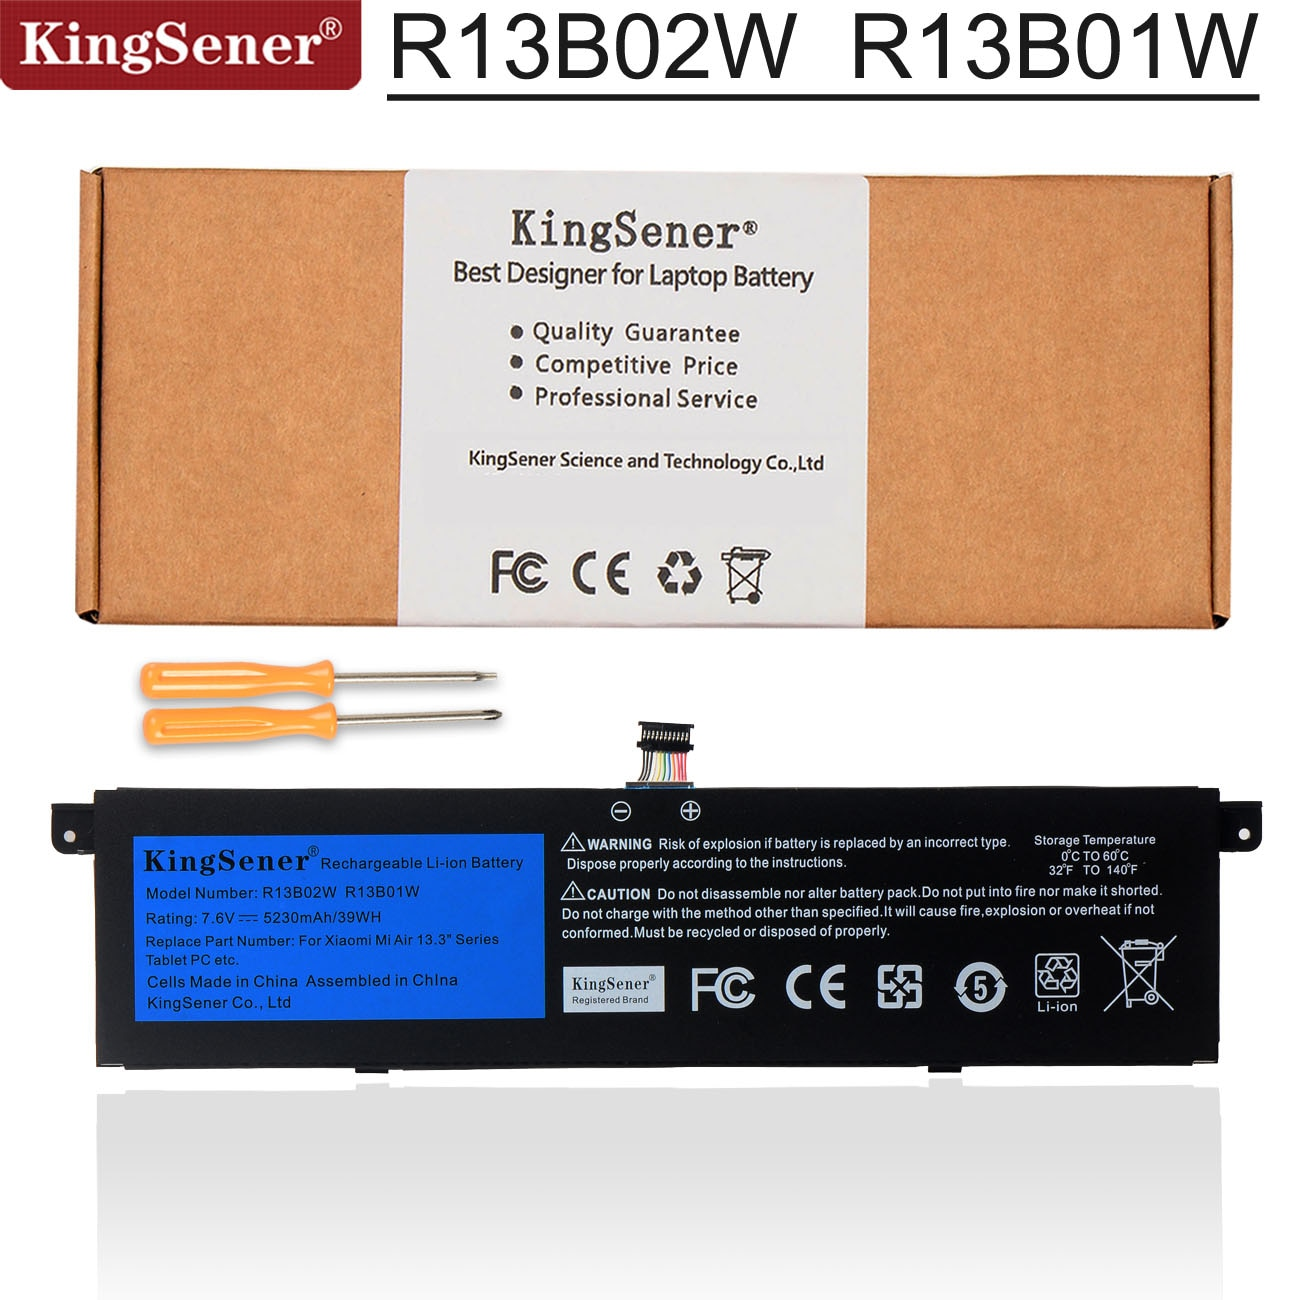 Kingsener 7.6V 5230mAh New R13B01W R13B02W Laptop Battery For Xiaomi Mi Air 13.3\